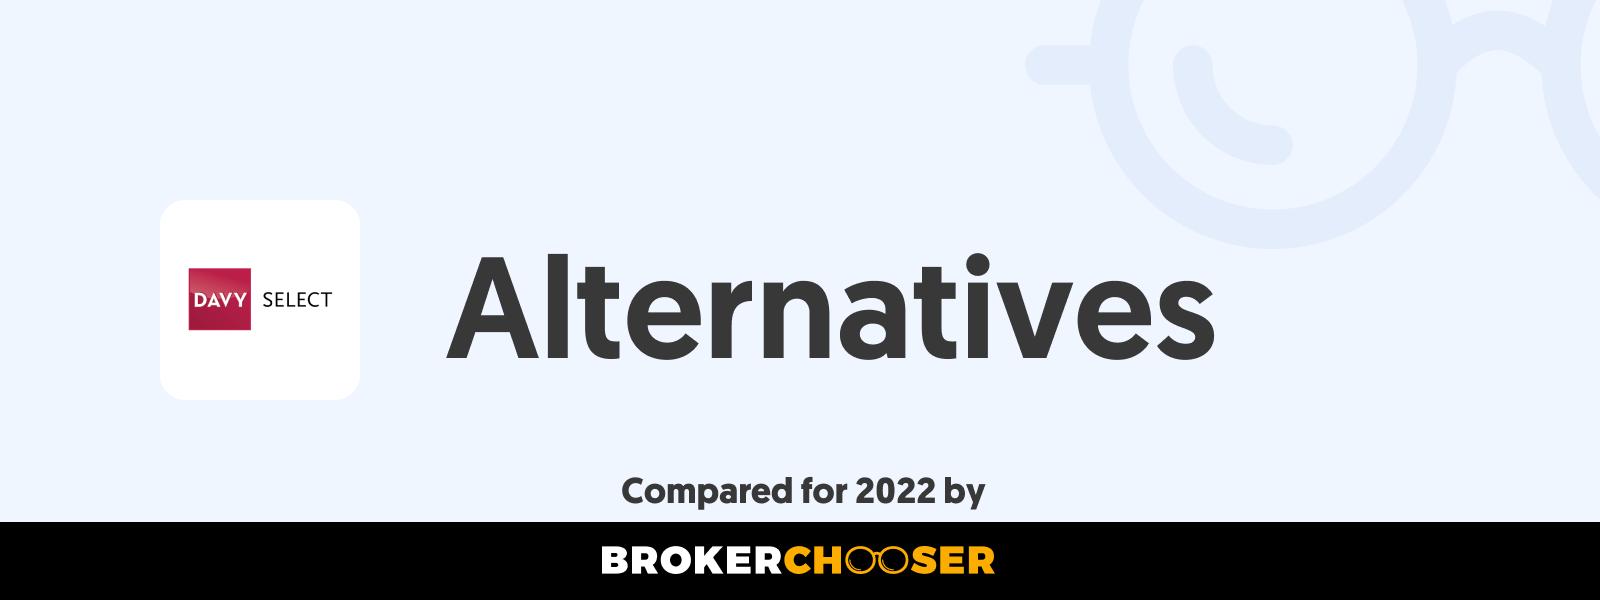 Davy Select Alternatives